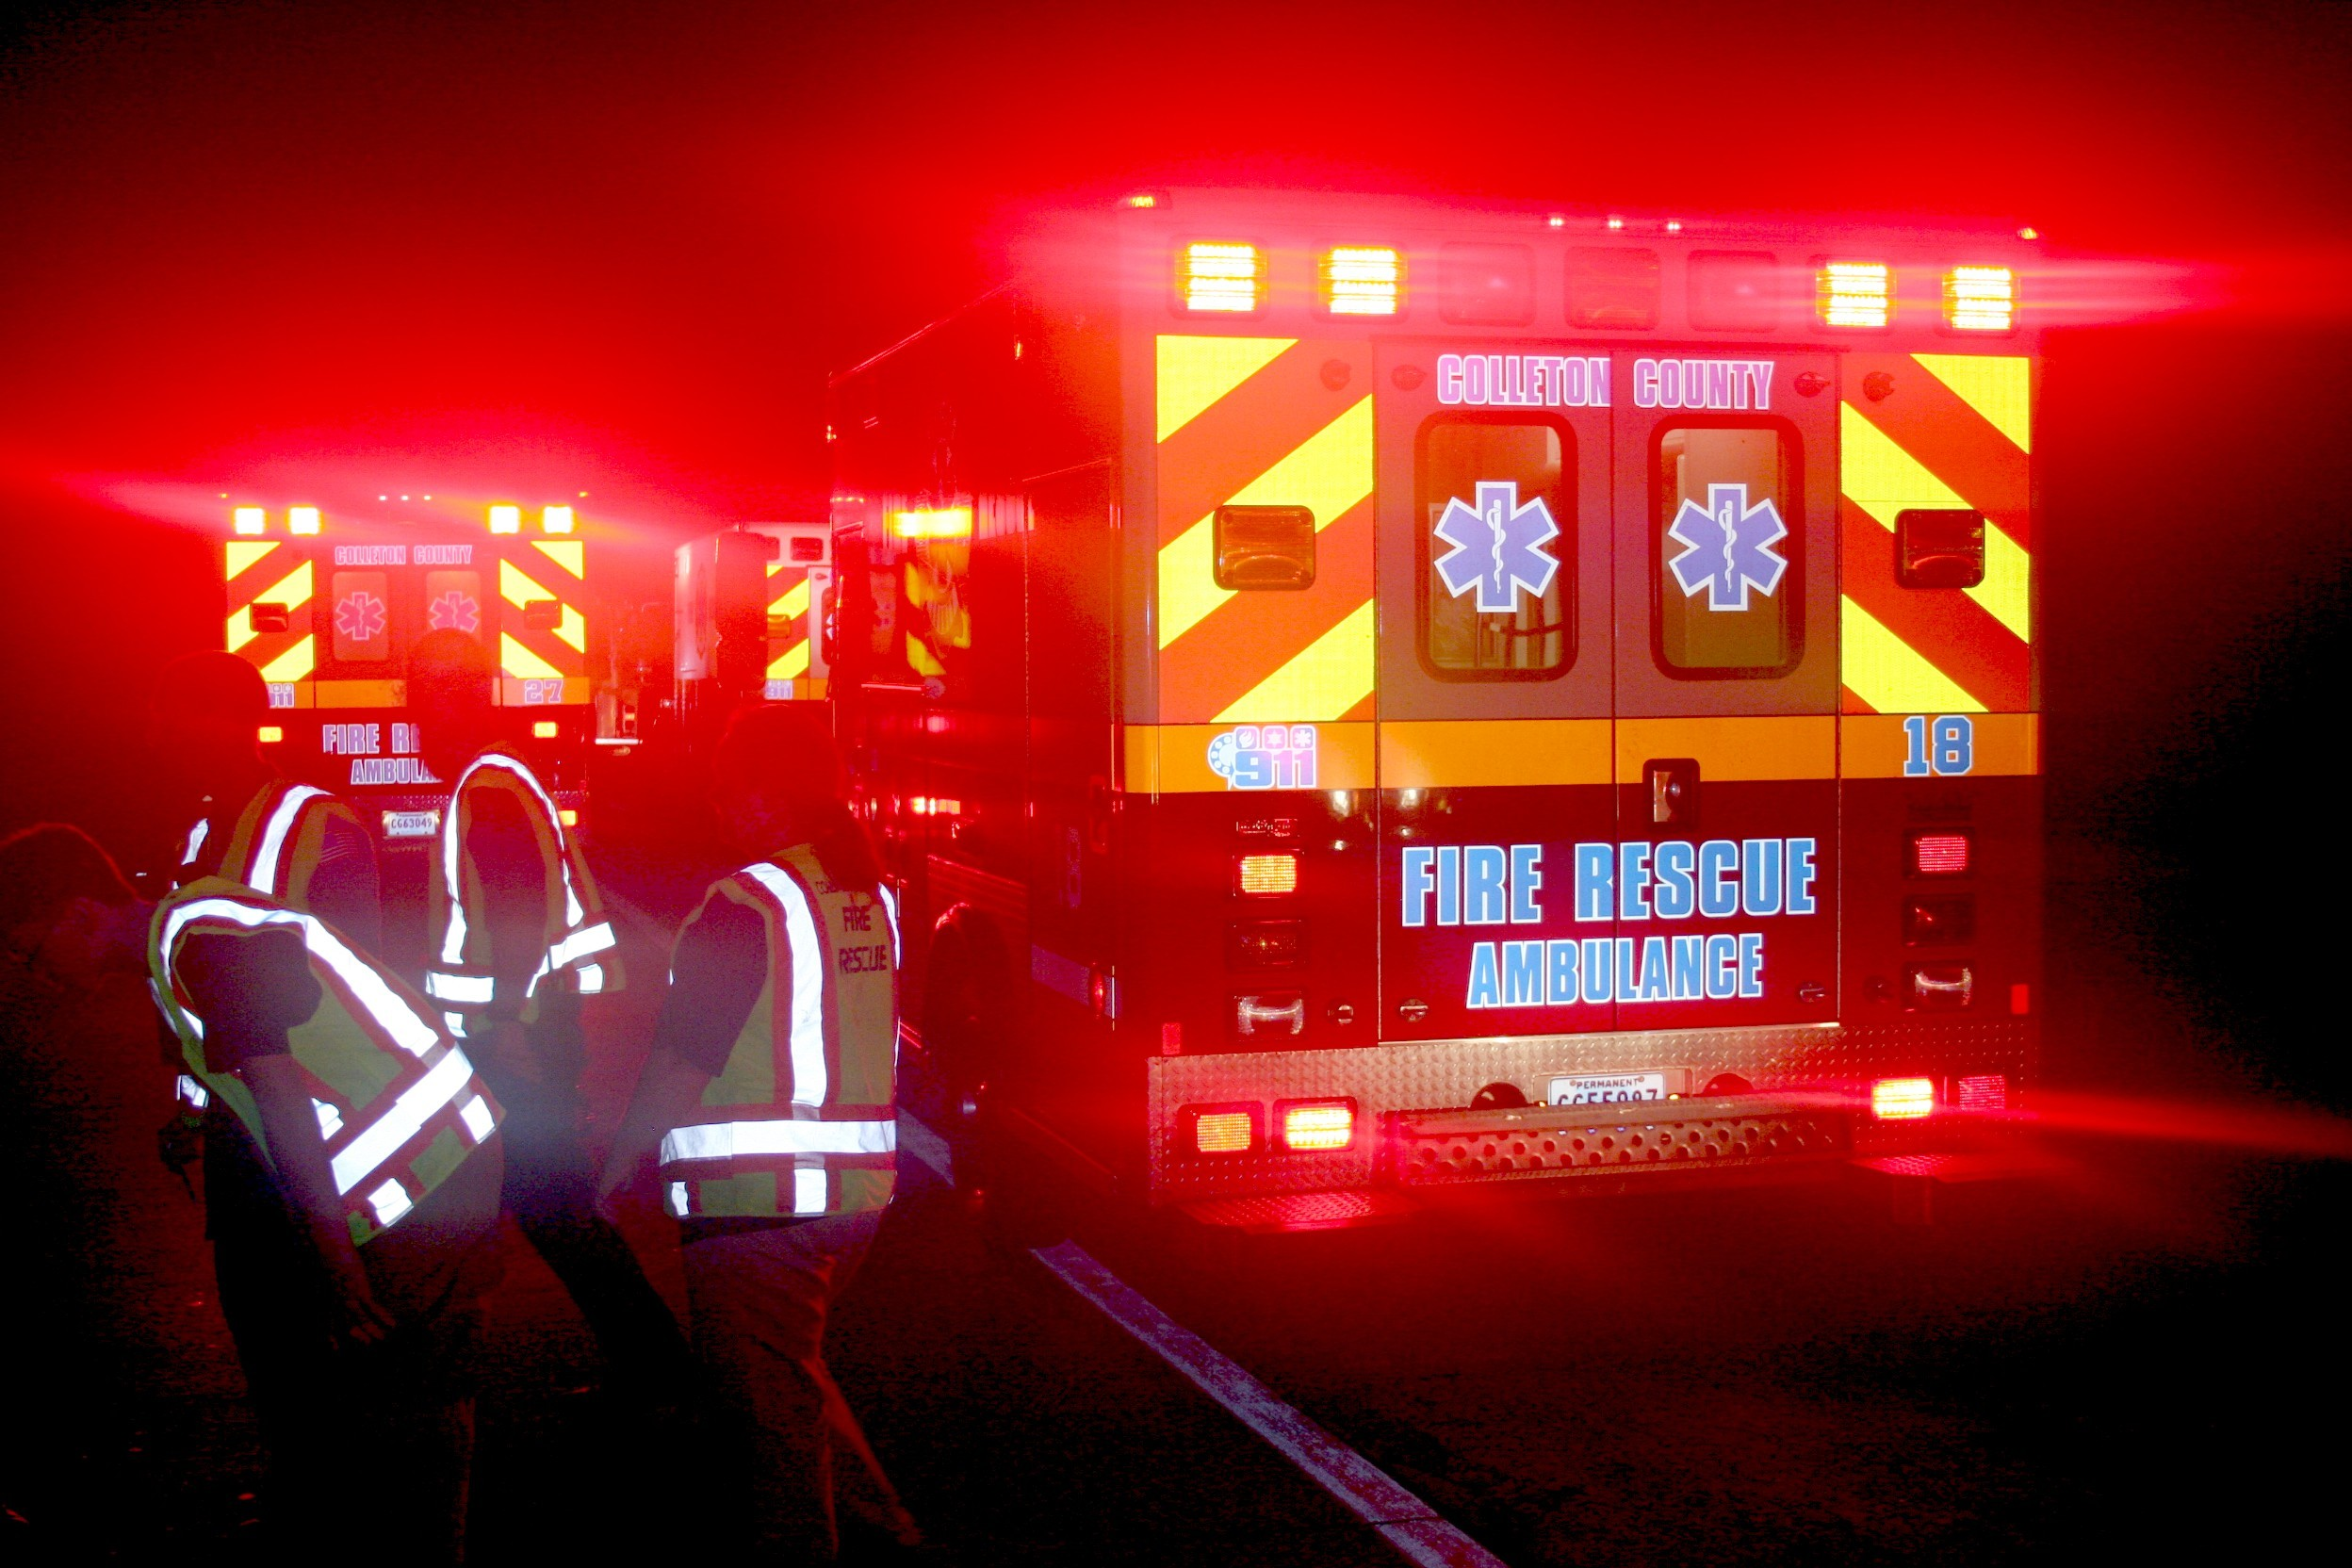 2496x1664 Paramedic Wallpaper Firefighter Trae